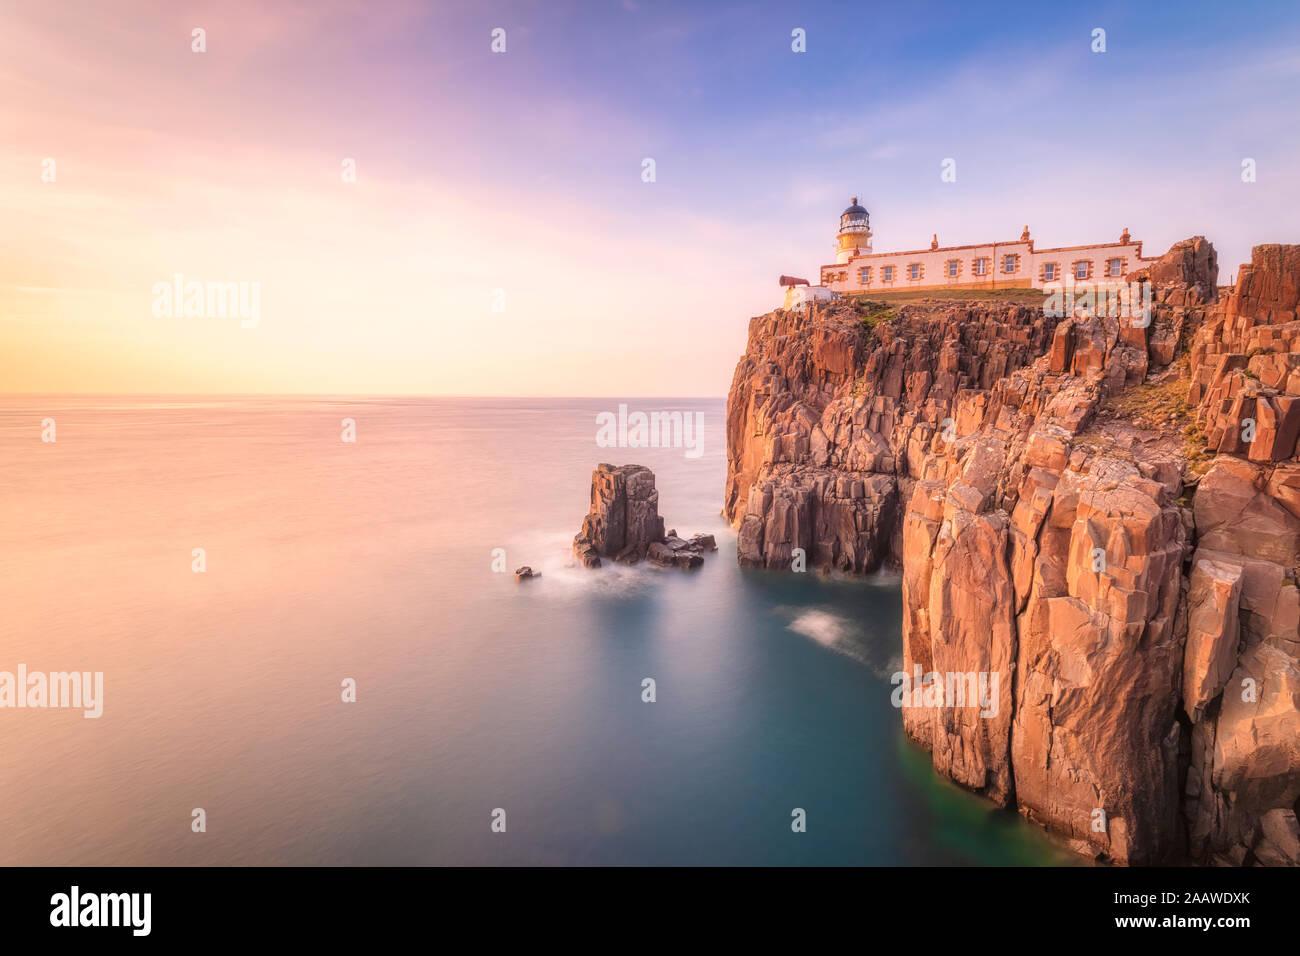 Neist Point Lighthouse by sea during sunset, Waterstein, Isle of Skye, Highlands, Scotland, UK Stock Photo